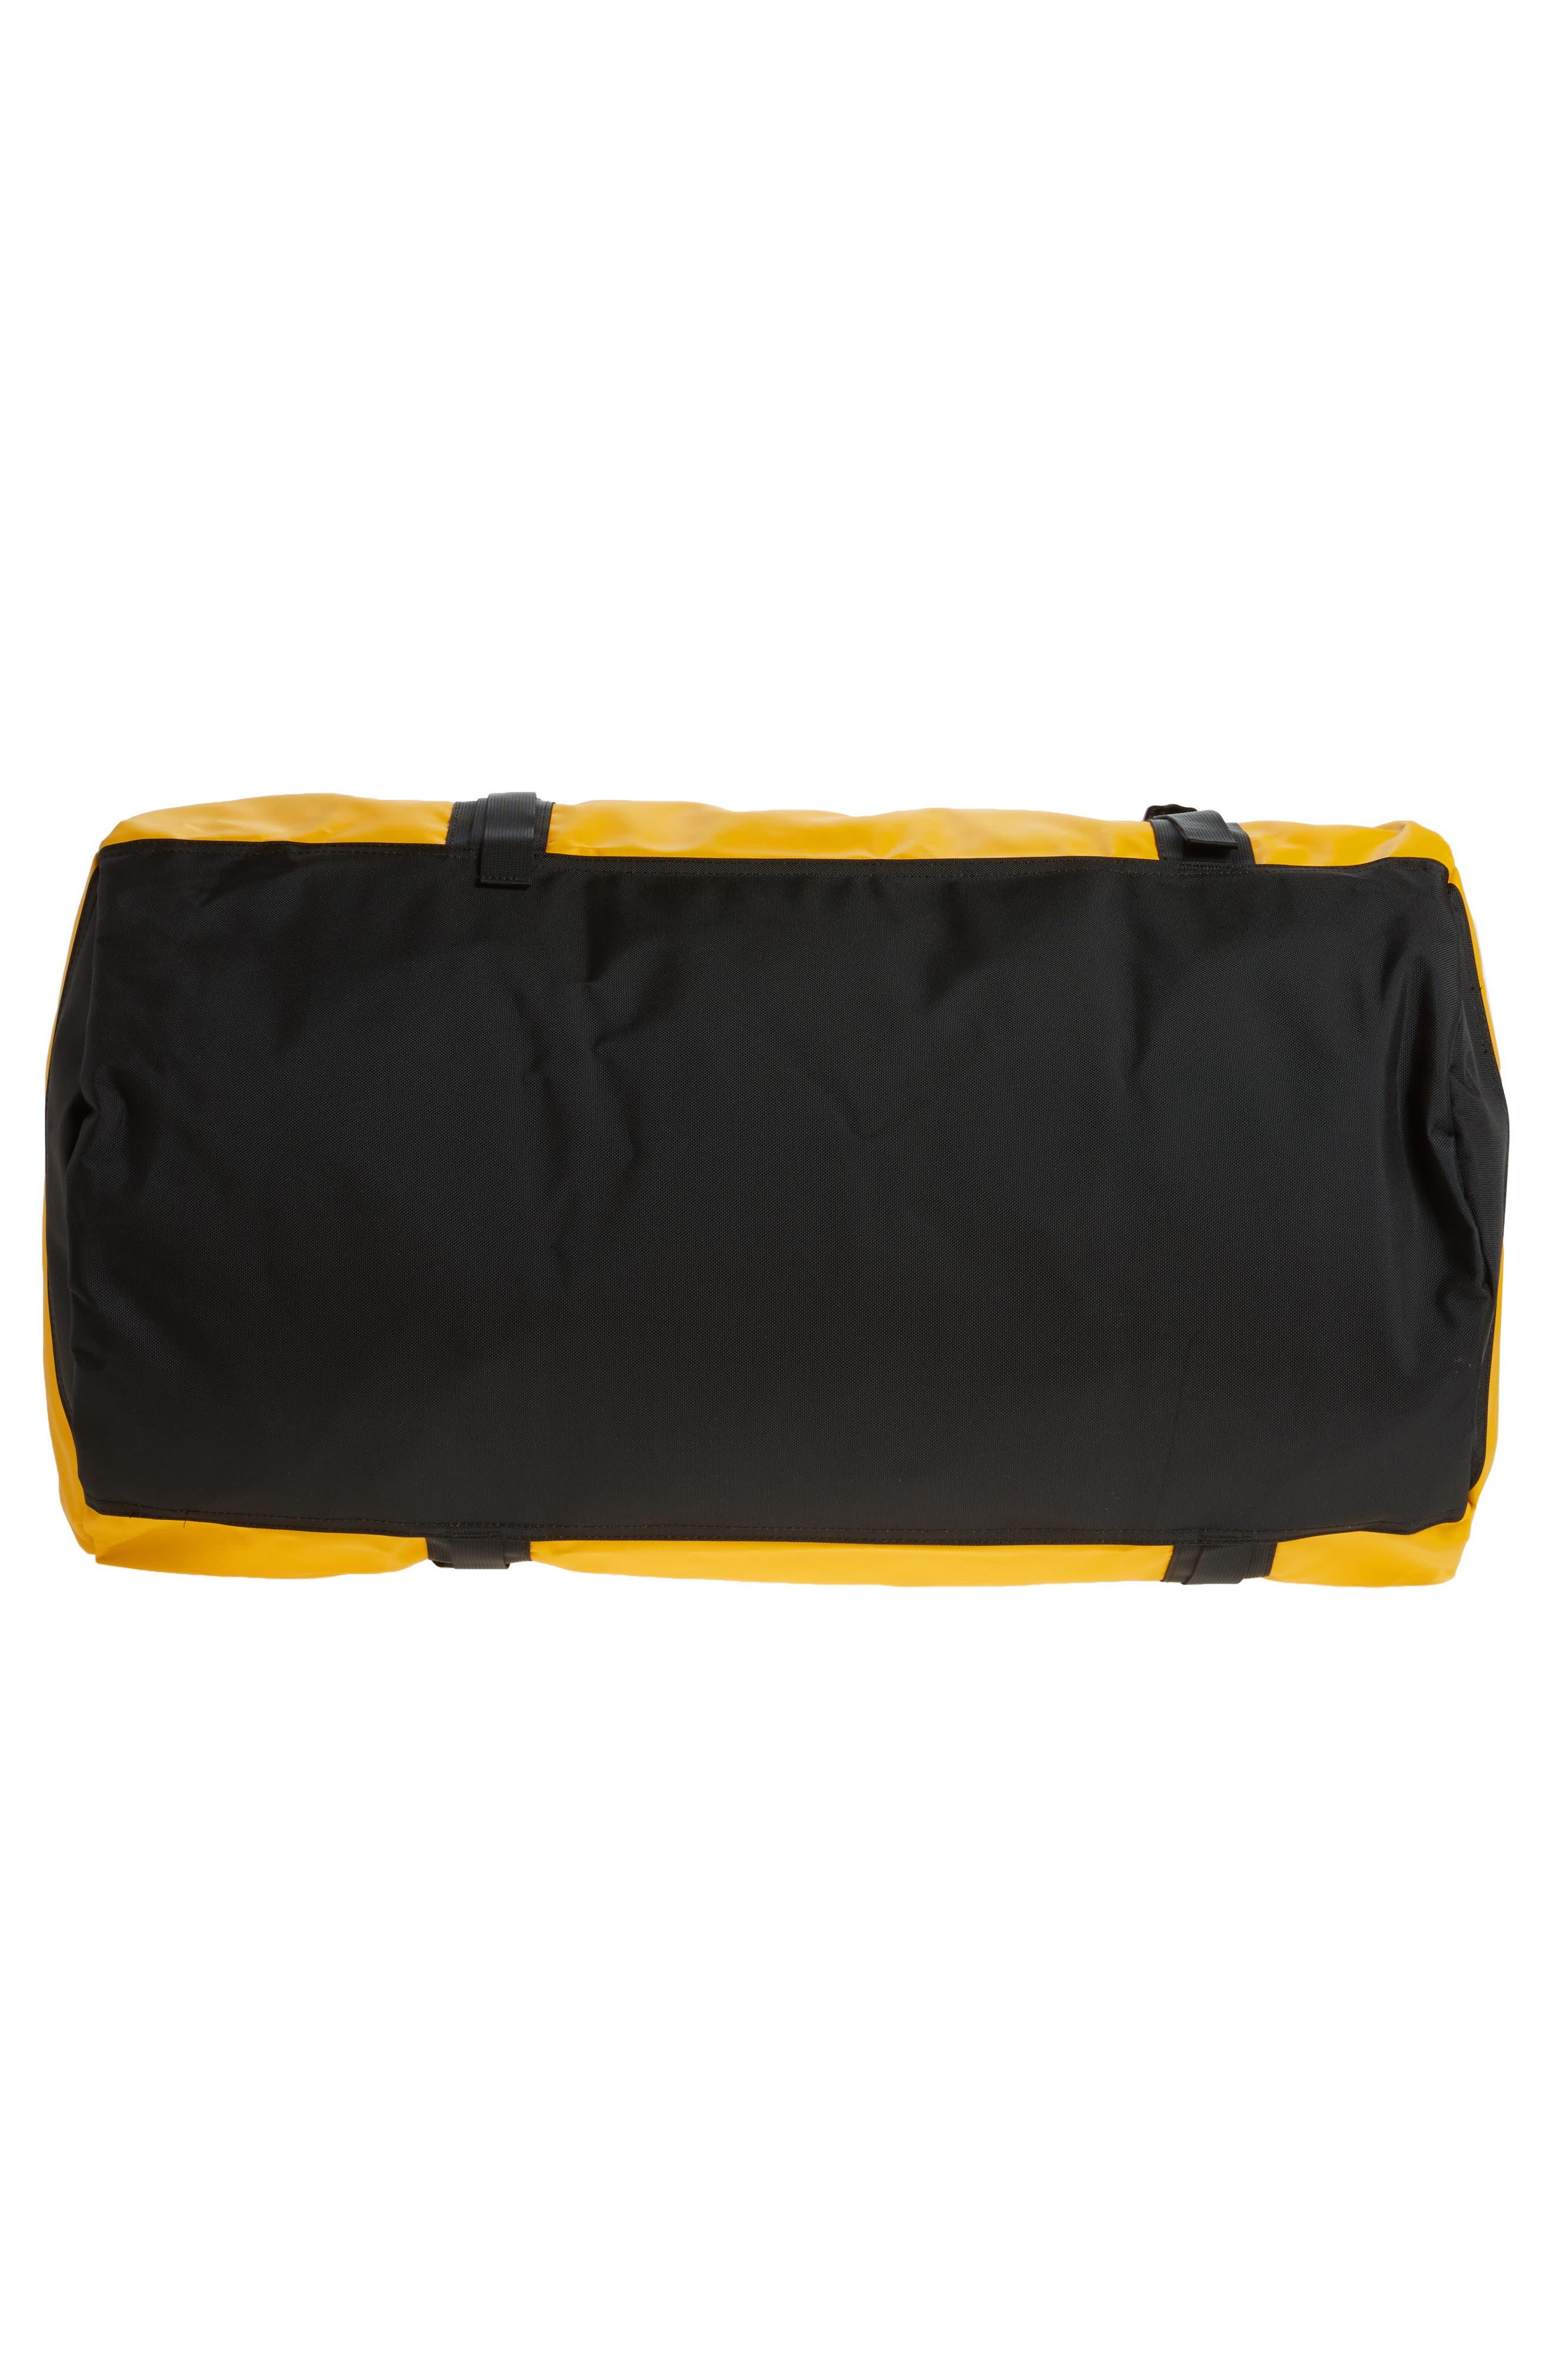 'Base Camp - Large' Duffel Bag,                             Alternate thumbnail 6, color,                             710